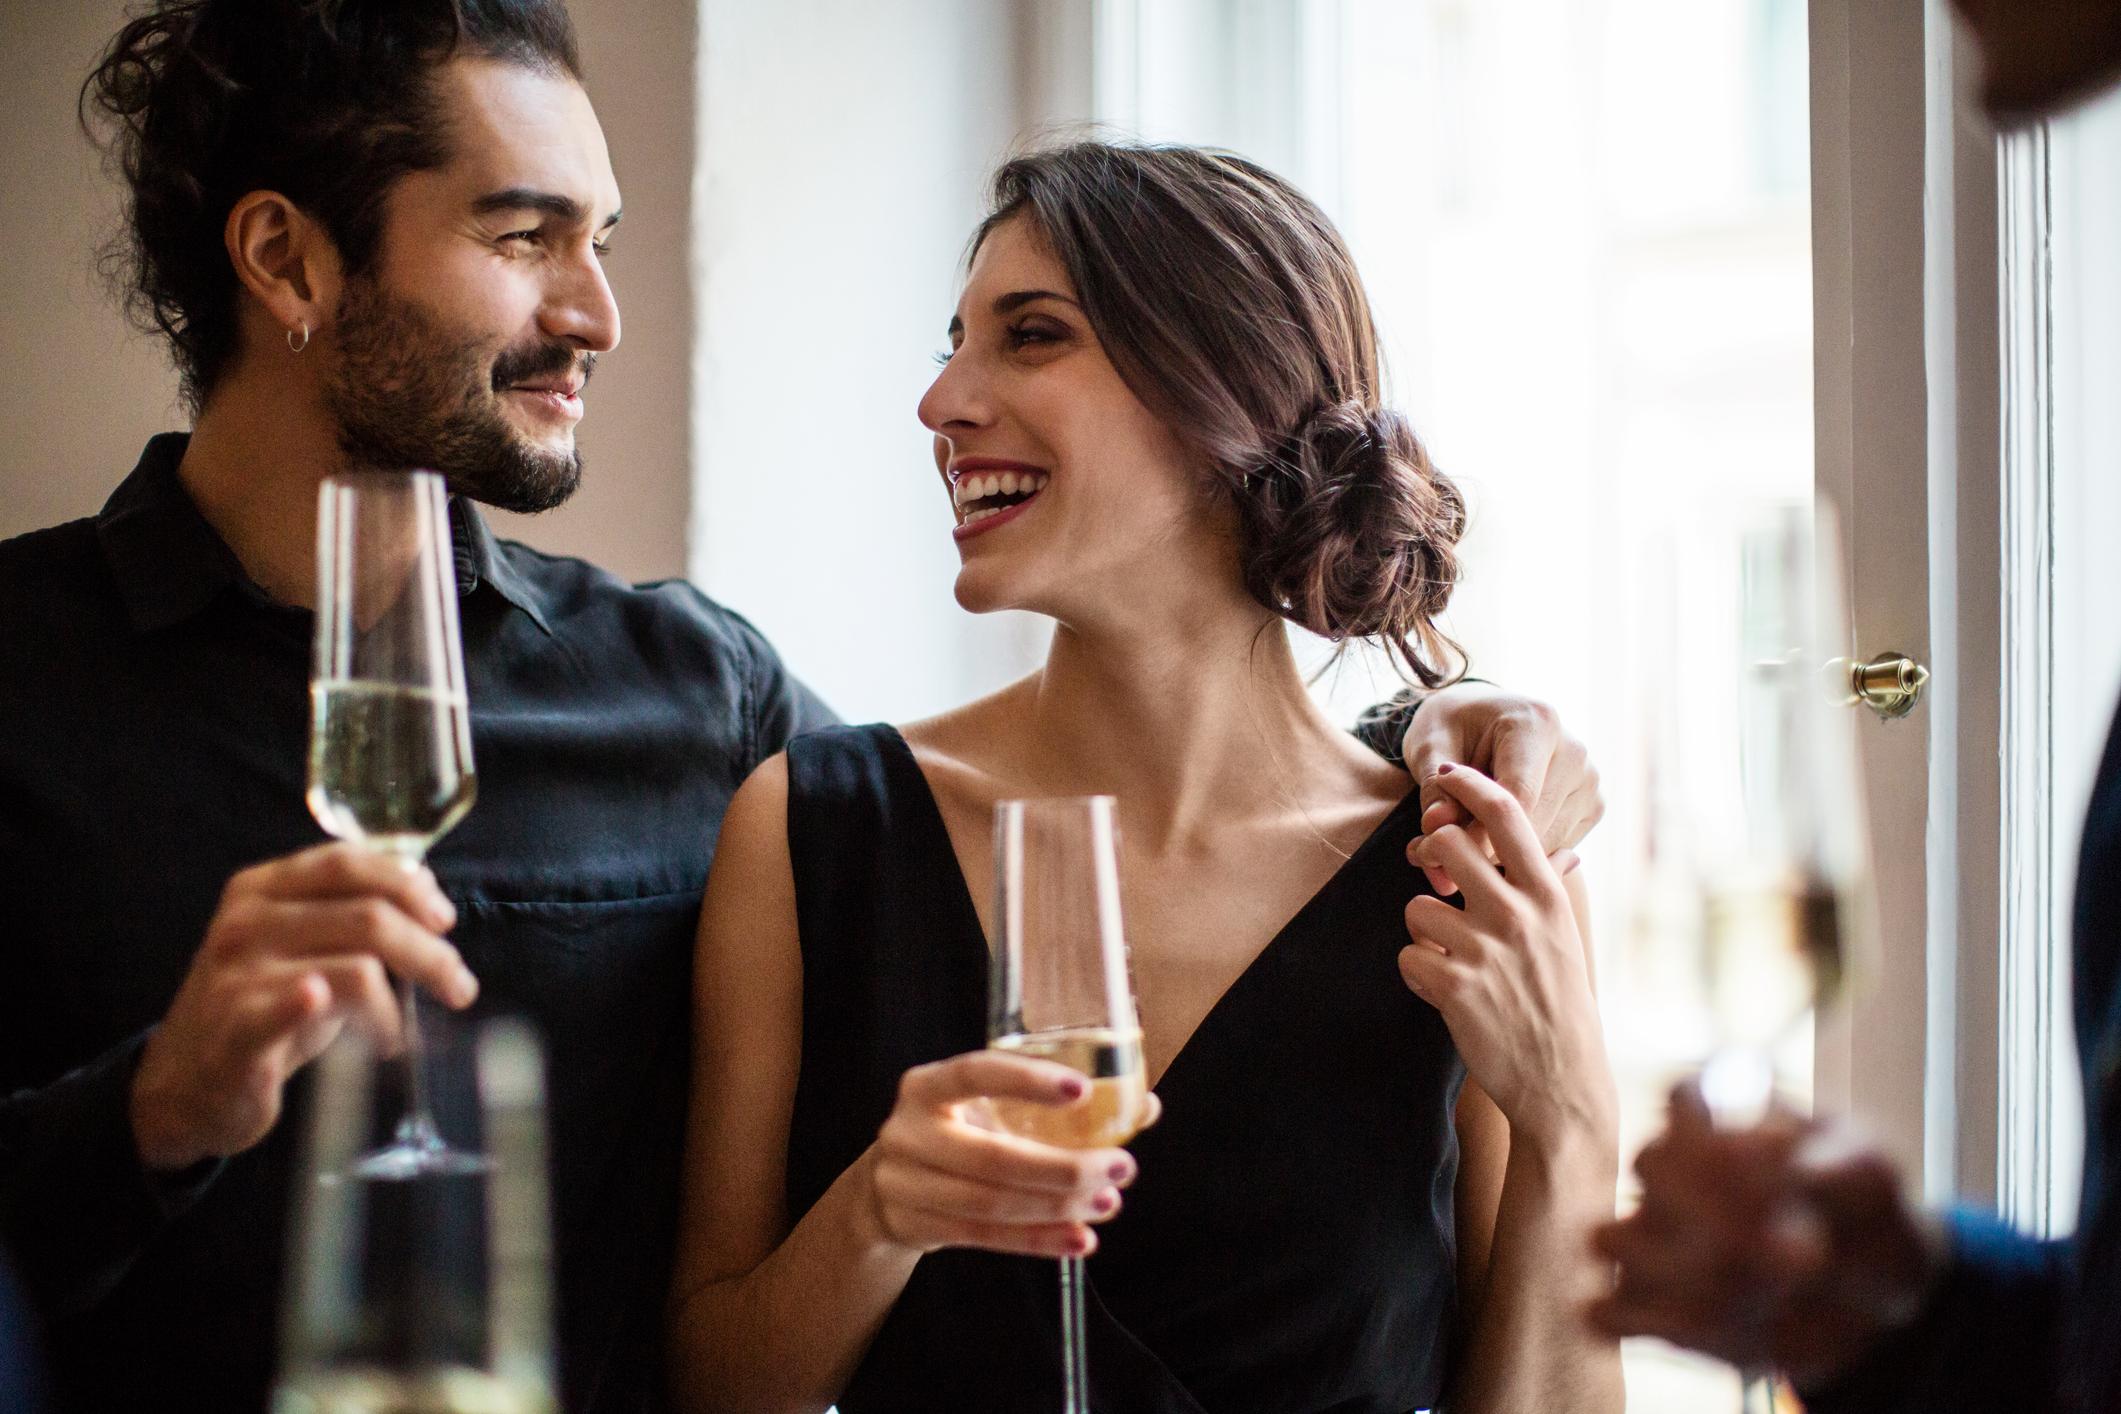 Capricorn Man Romance Traits and Behaviors | LoveToKnow